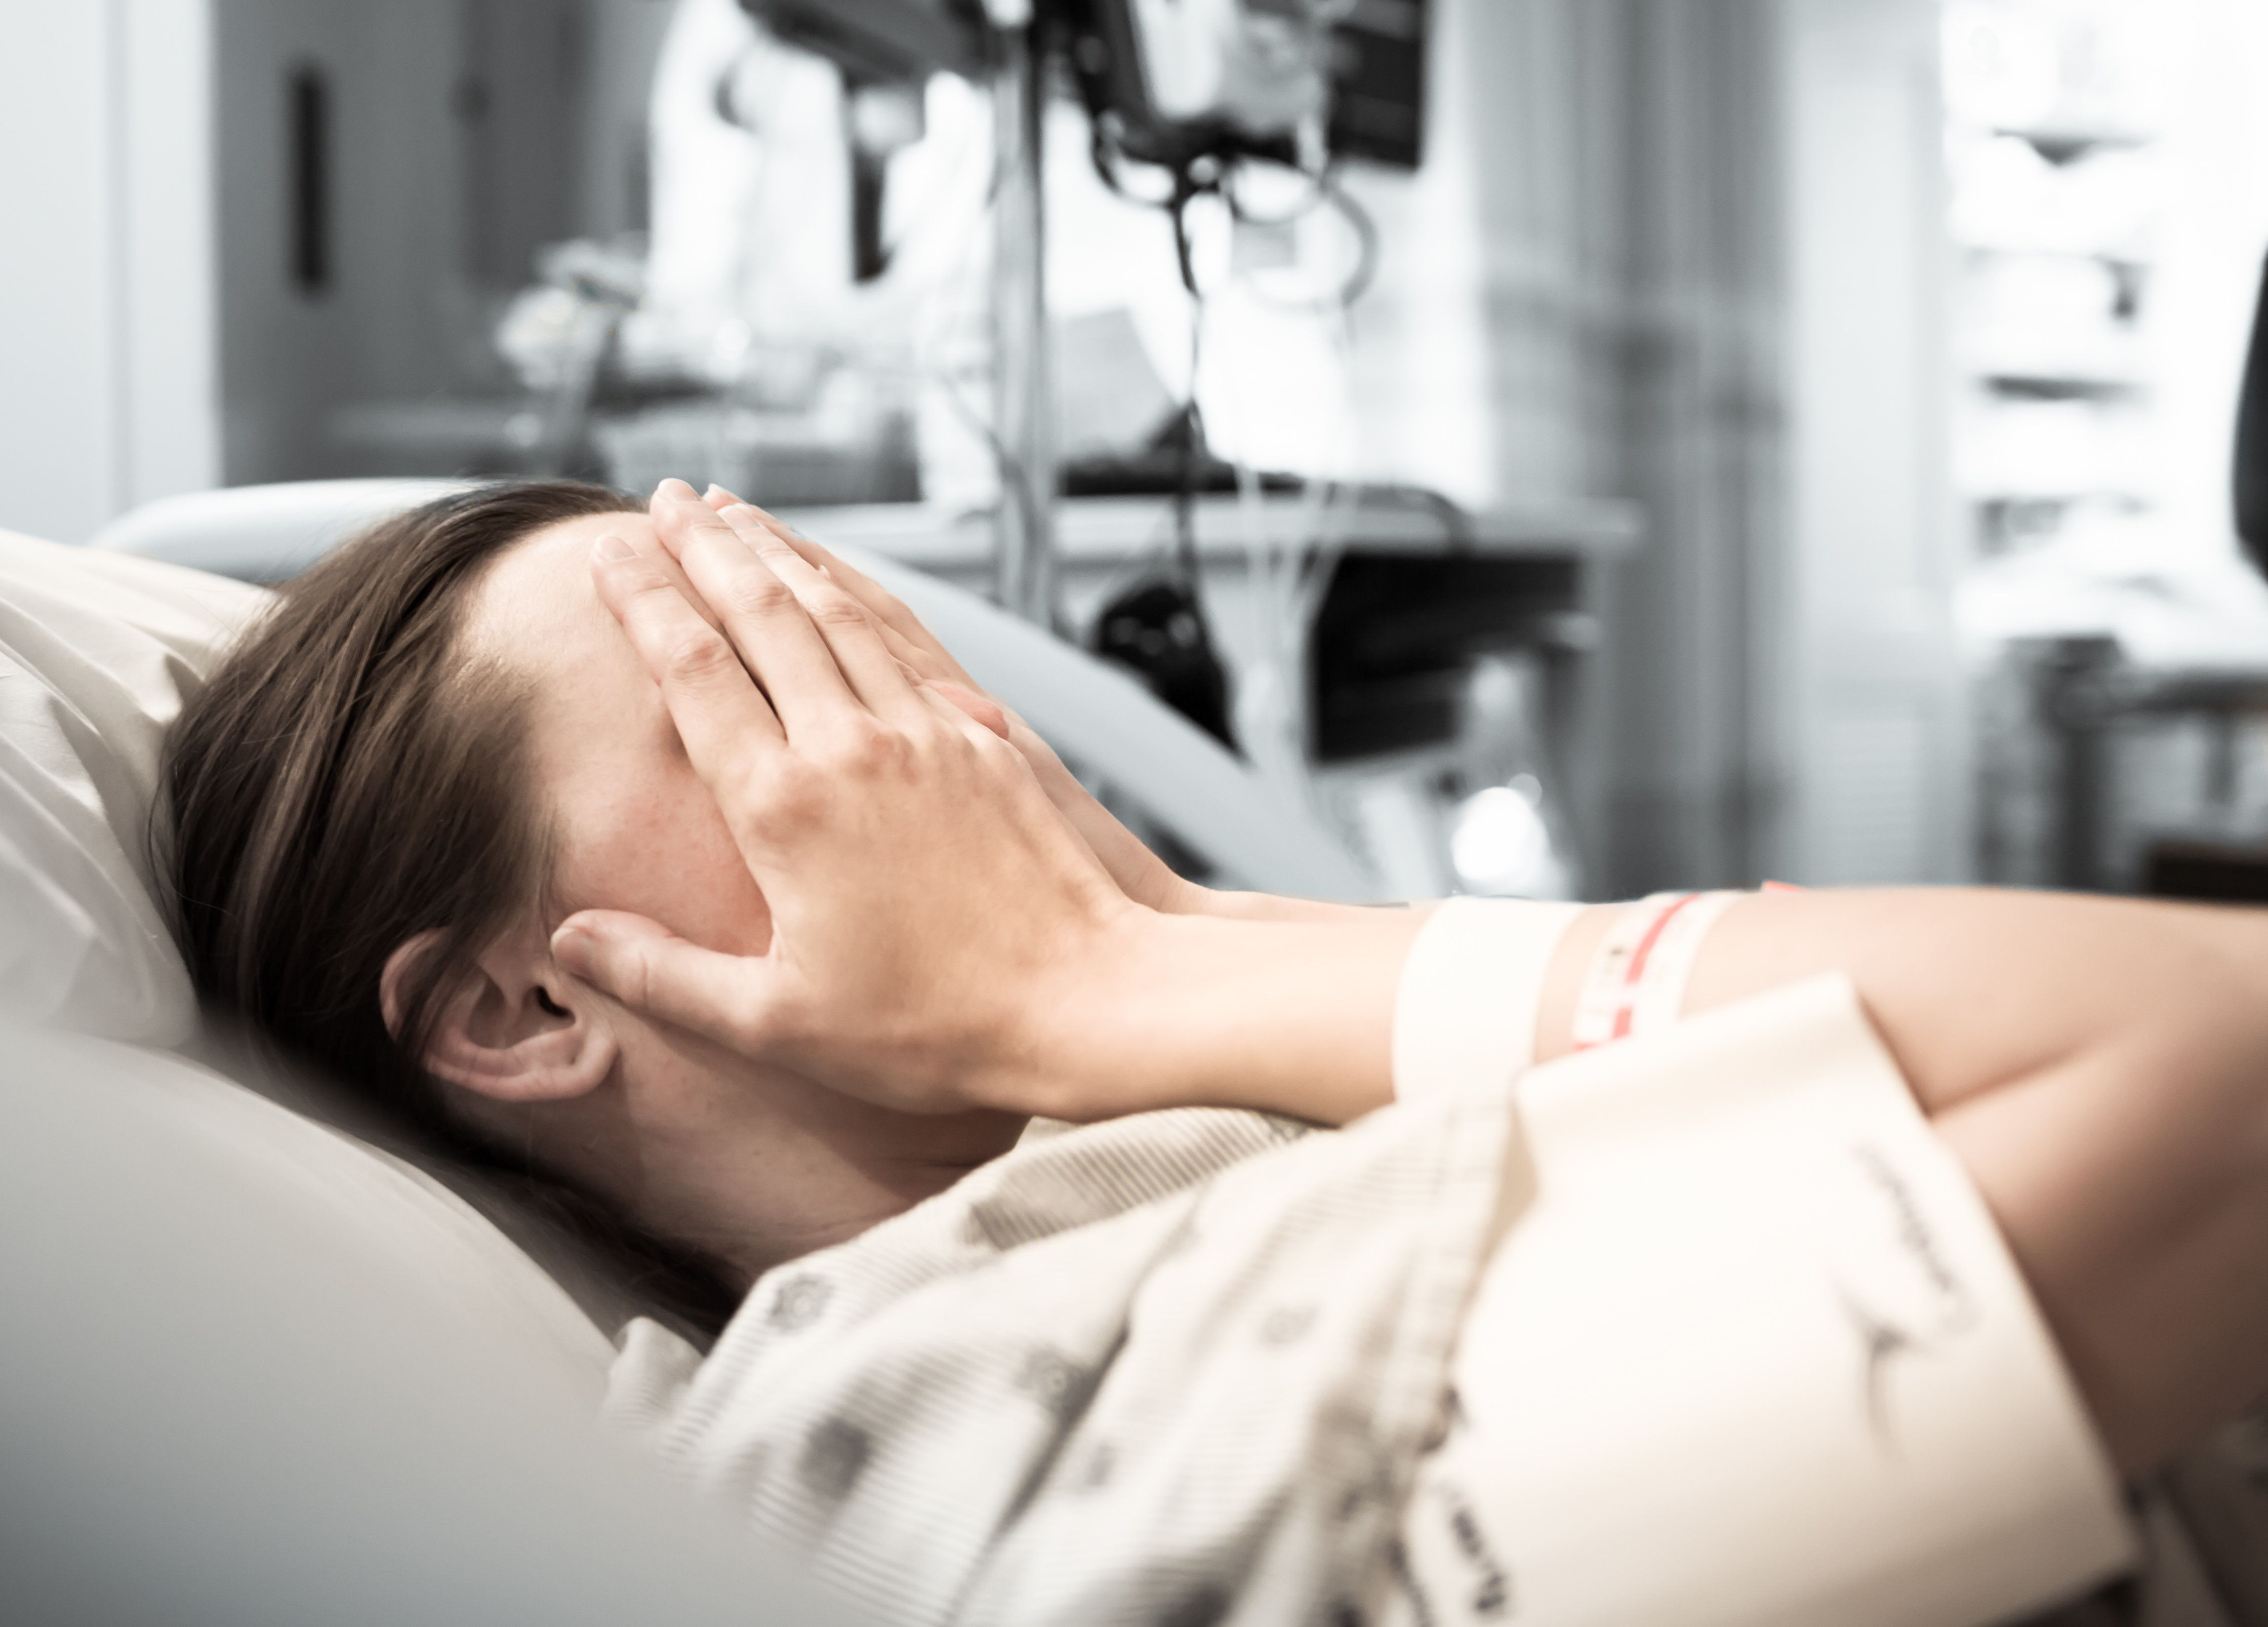 Ist Herpes bald heilbar? Forscher entwickeln Killerzellen gegen Herpes-Viren